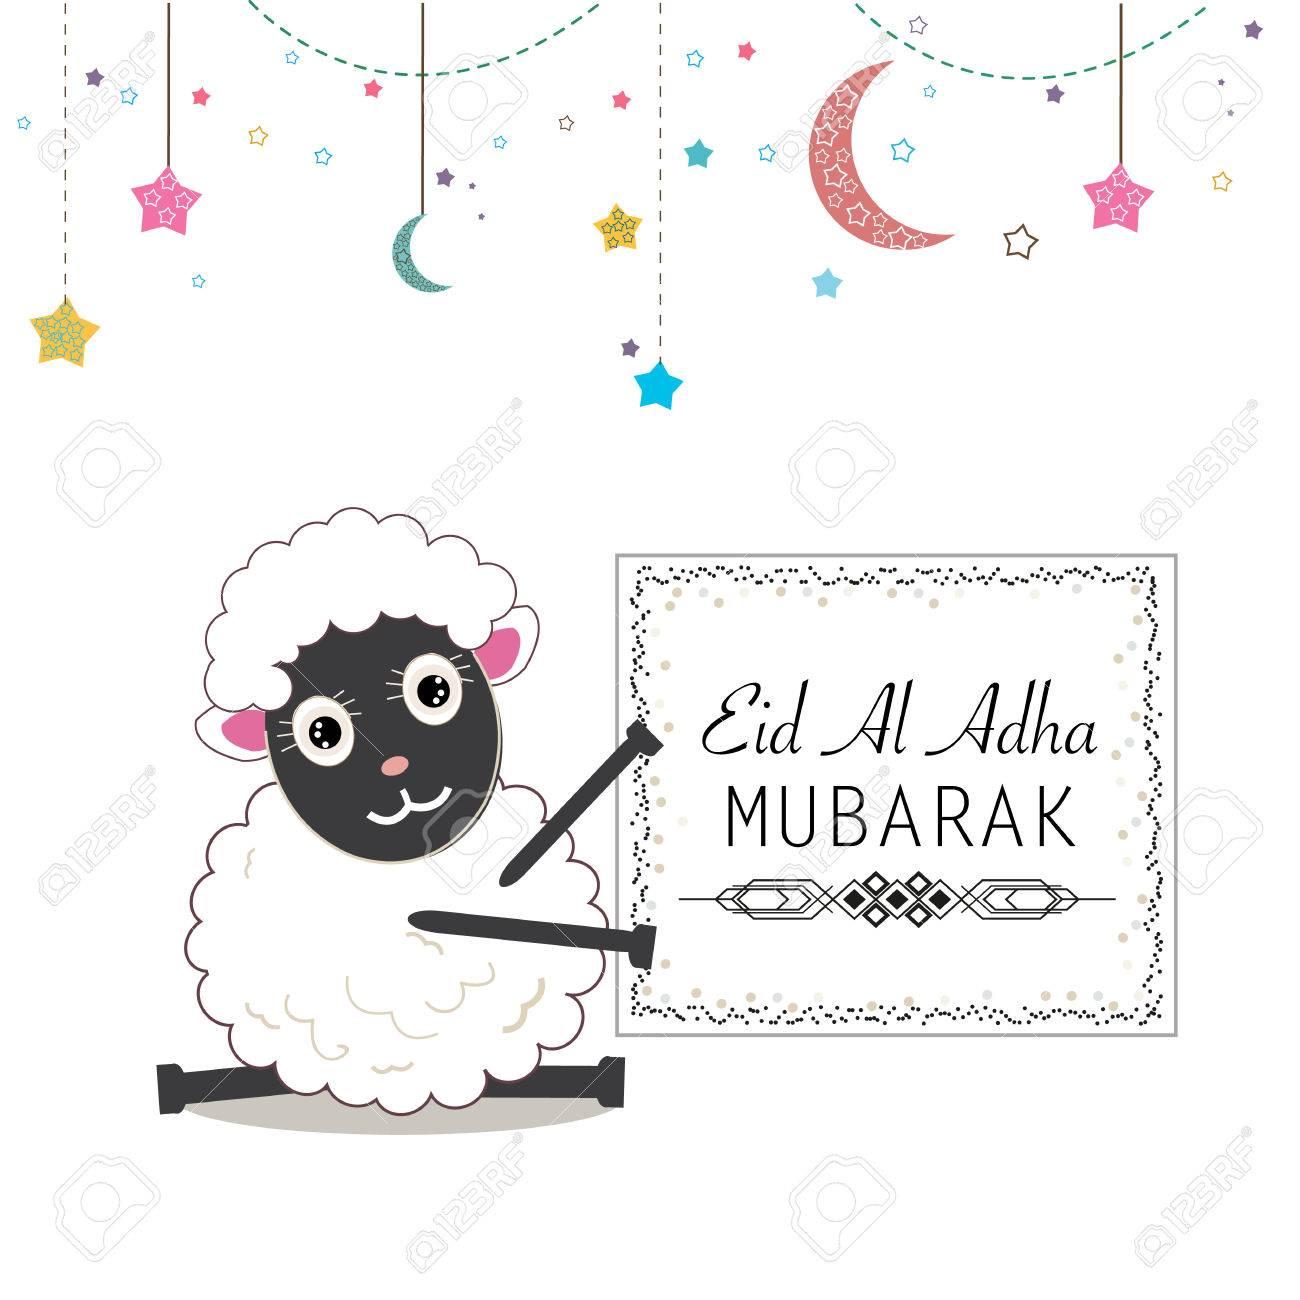 Cute sheep vector illustration. Colorful balloon. Islamic Festival of Sacrifice, Eid-Al-Adha celebration greeting card - 60215678